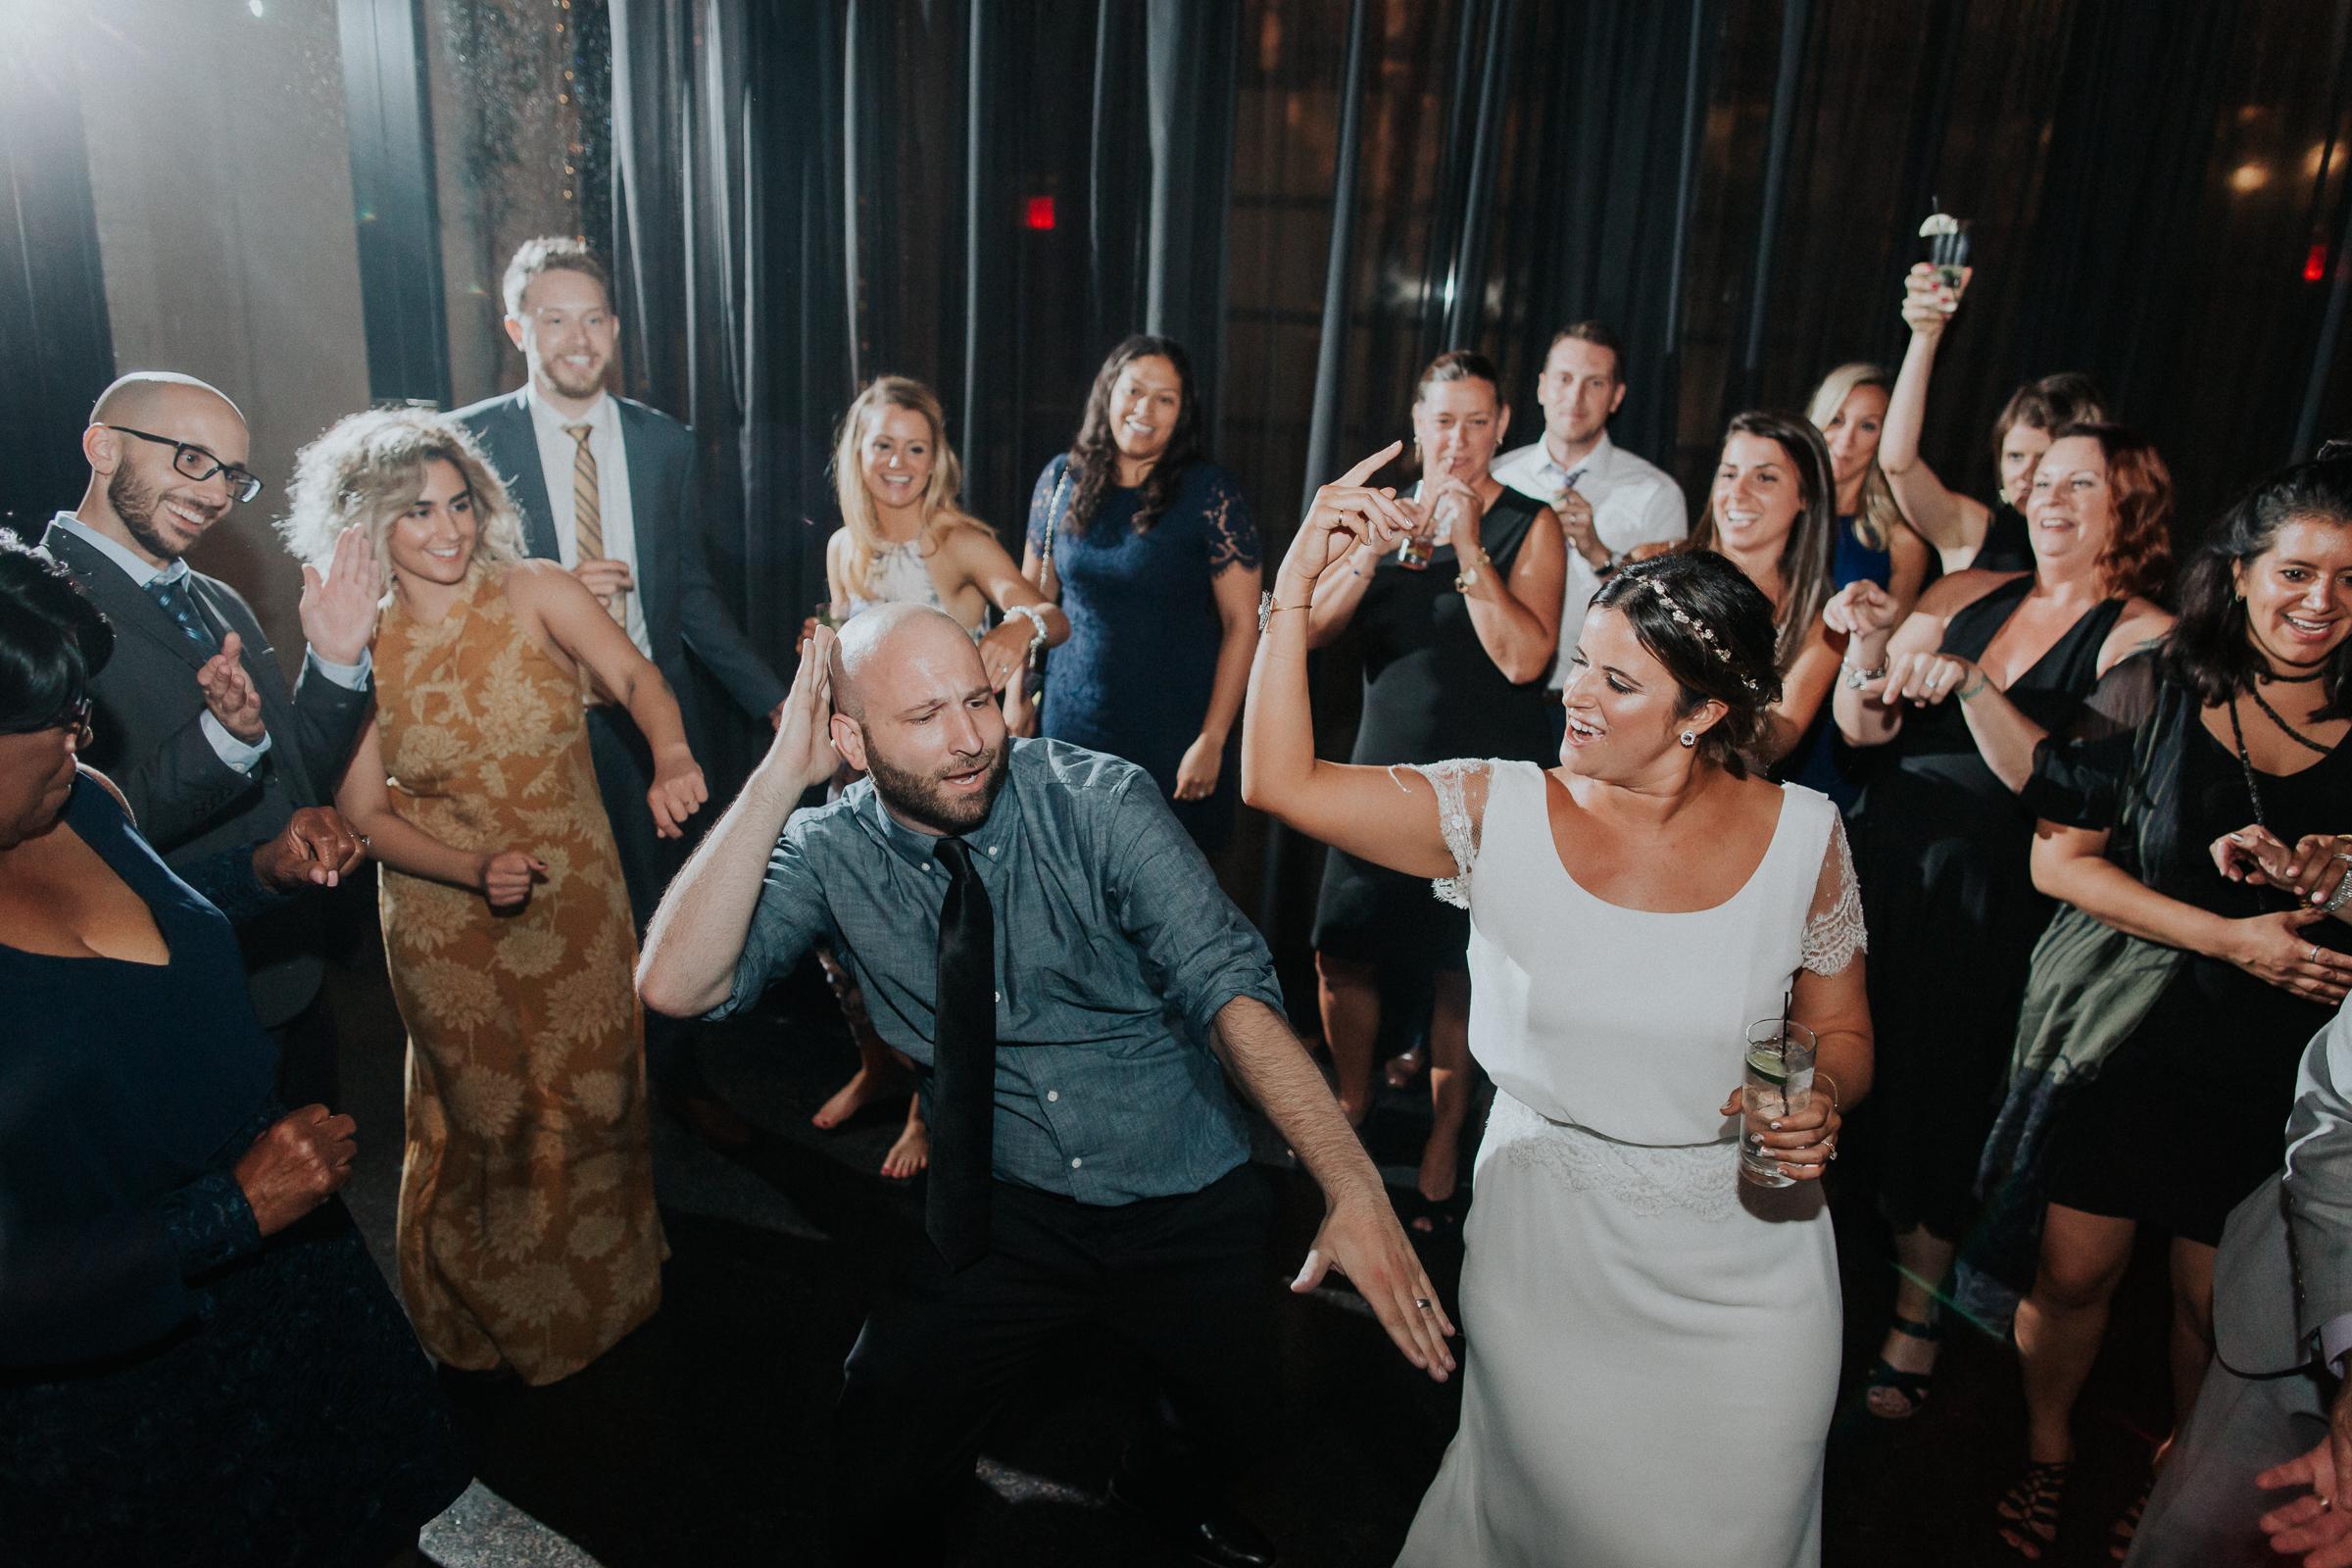 501-Union-Brooklyn-Fine-Art-Documentary-Wedding-Photographer-141.jpg